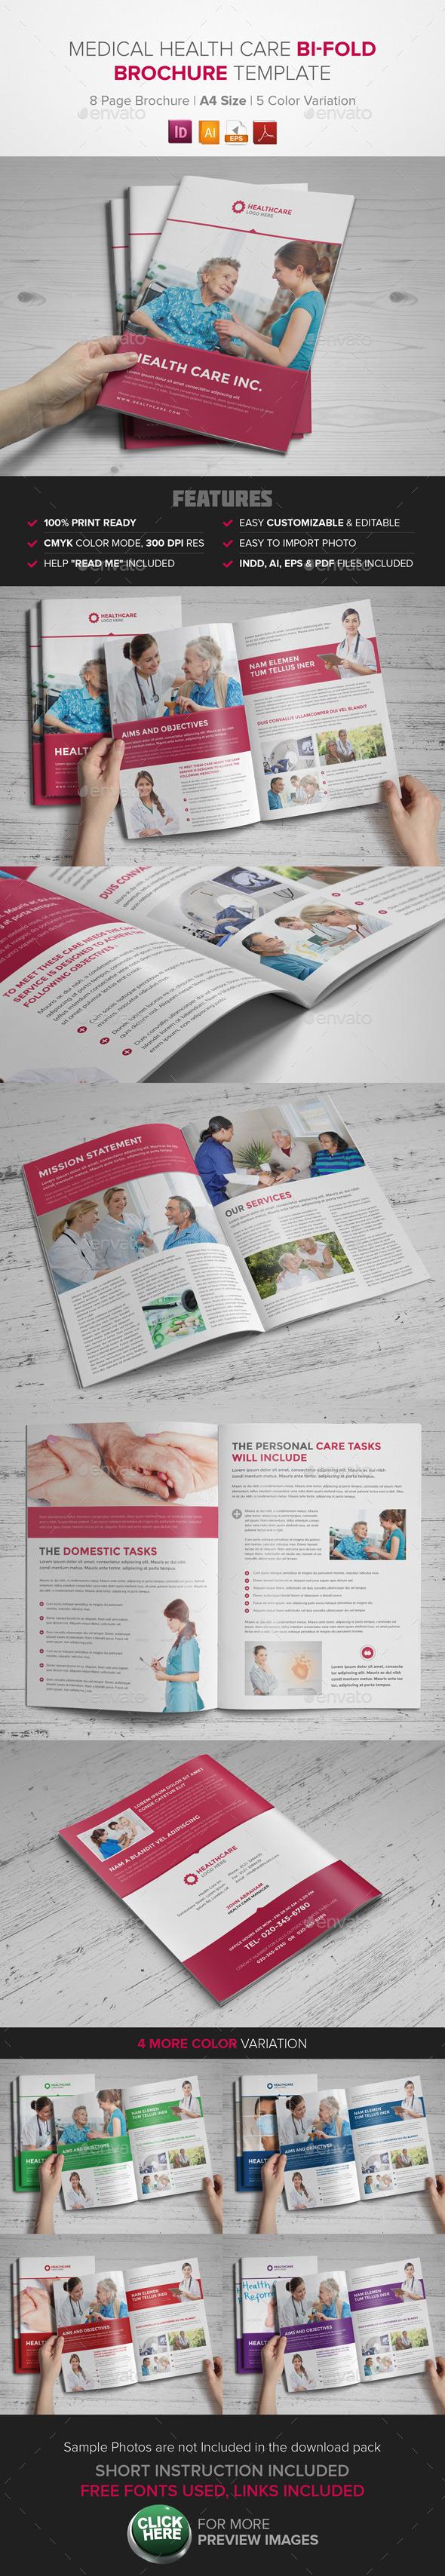 GraphicRiver Medical Health Care Bifold Brochure InDesign 9272838